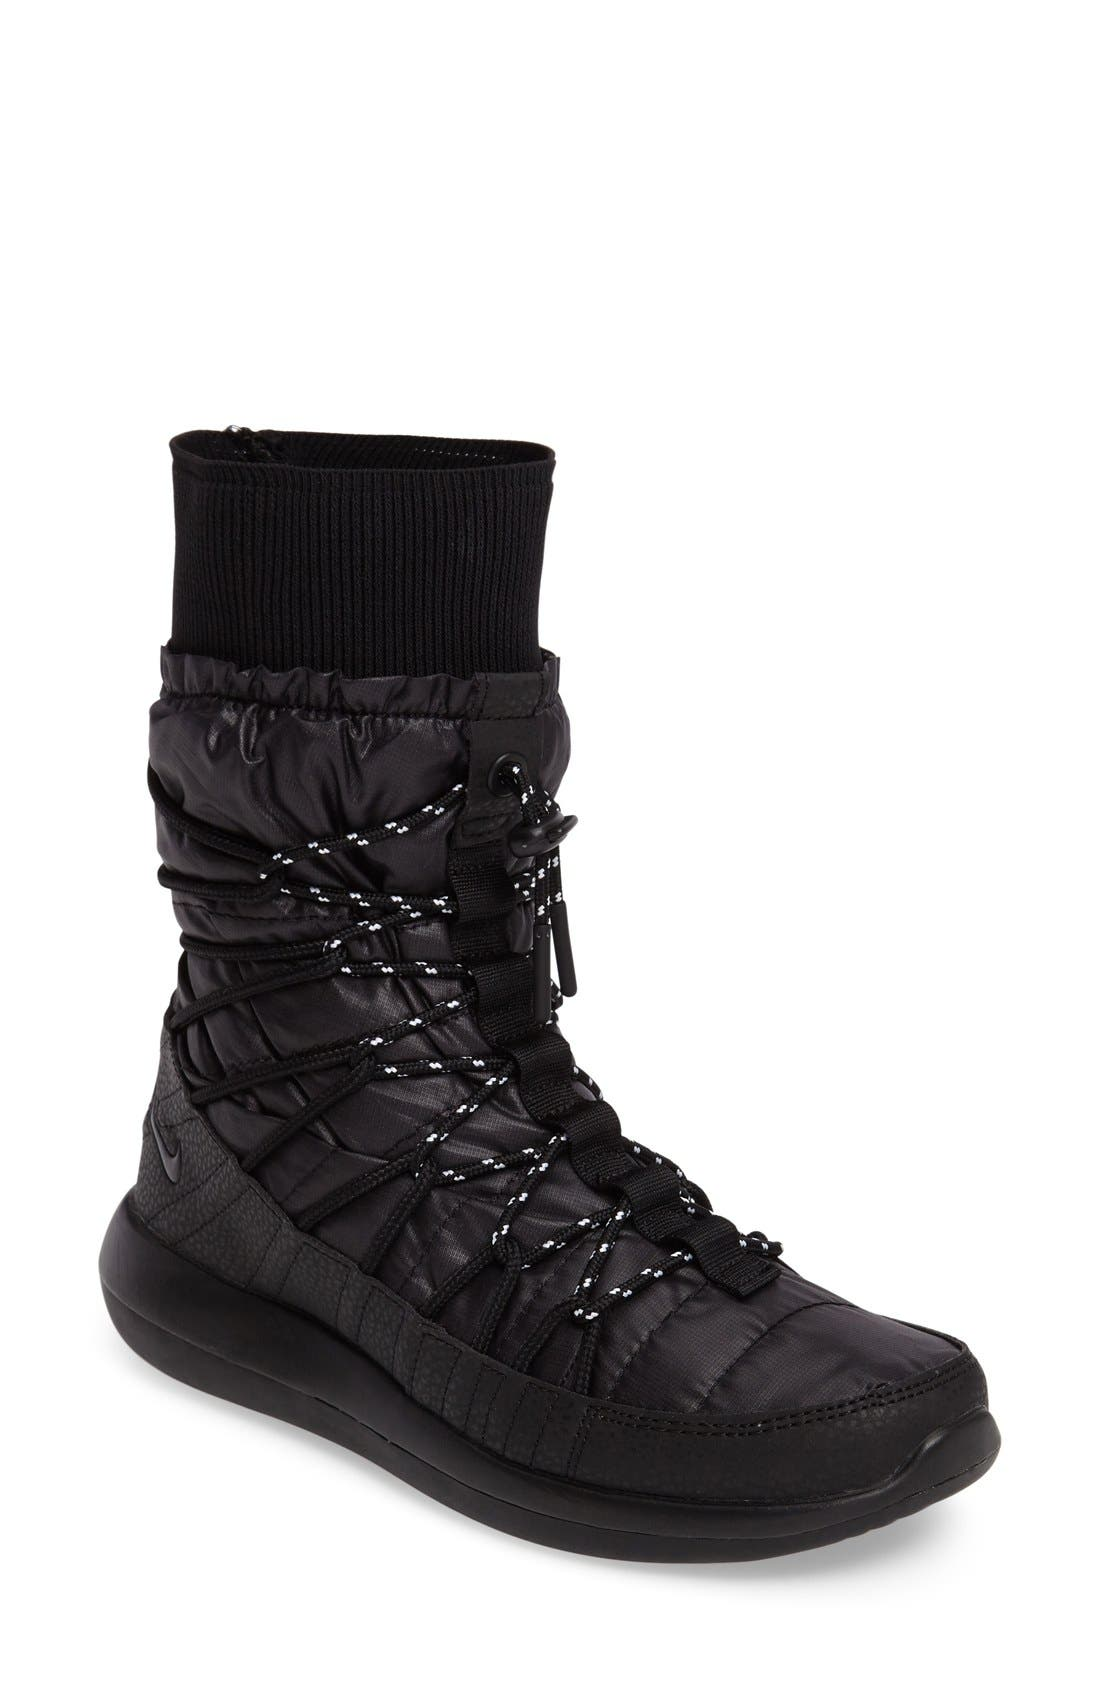 Nike high top shoes for women